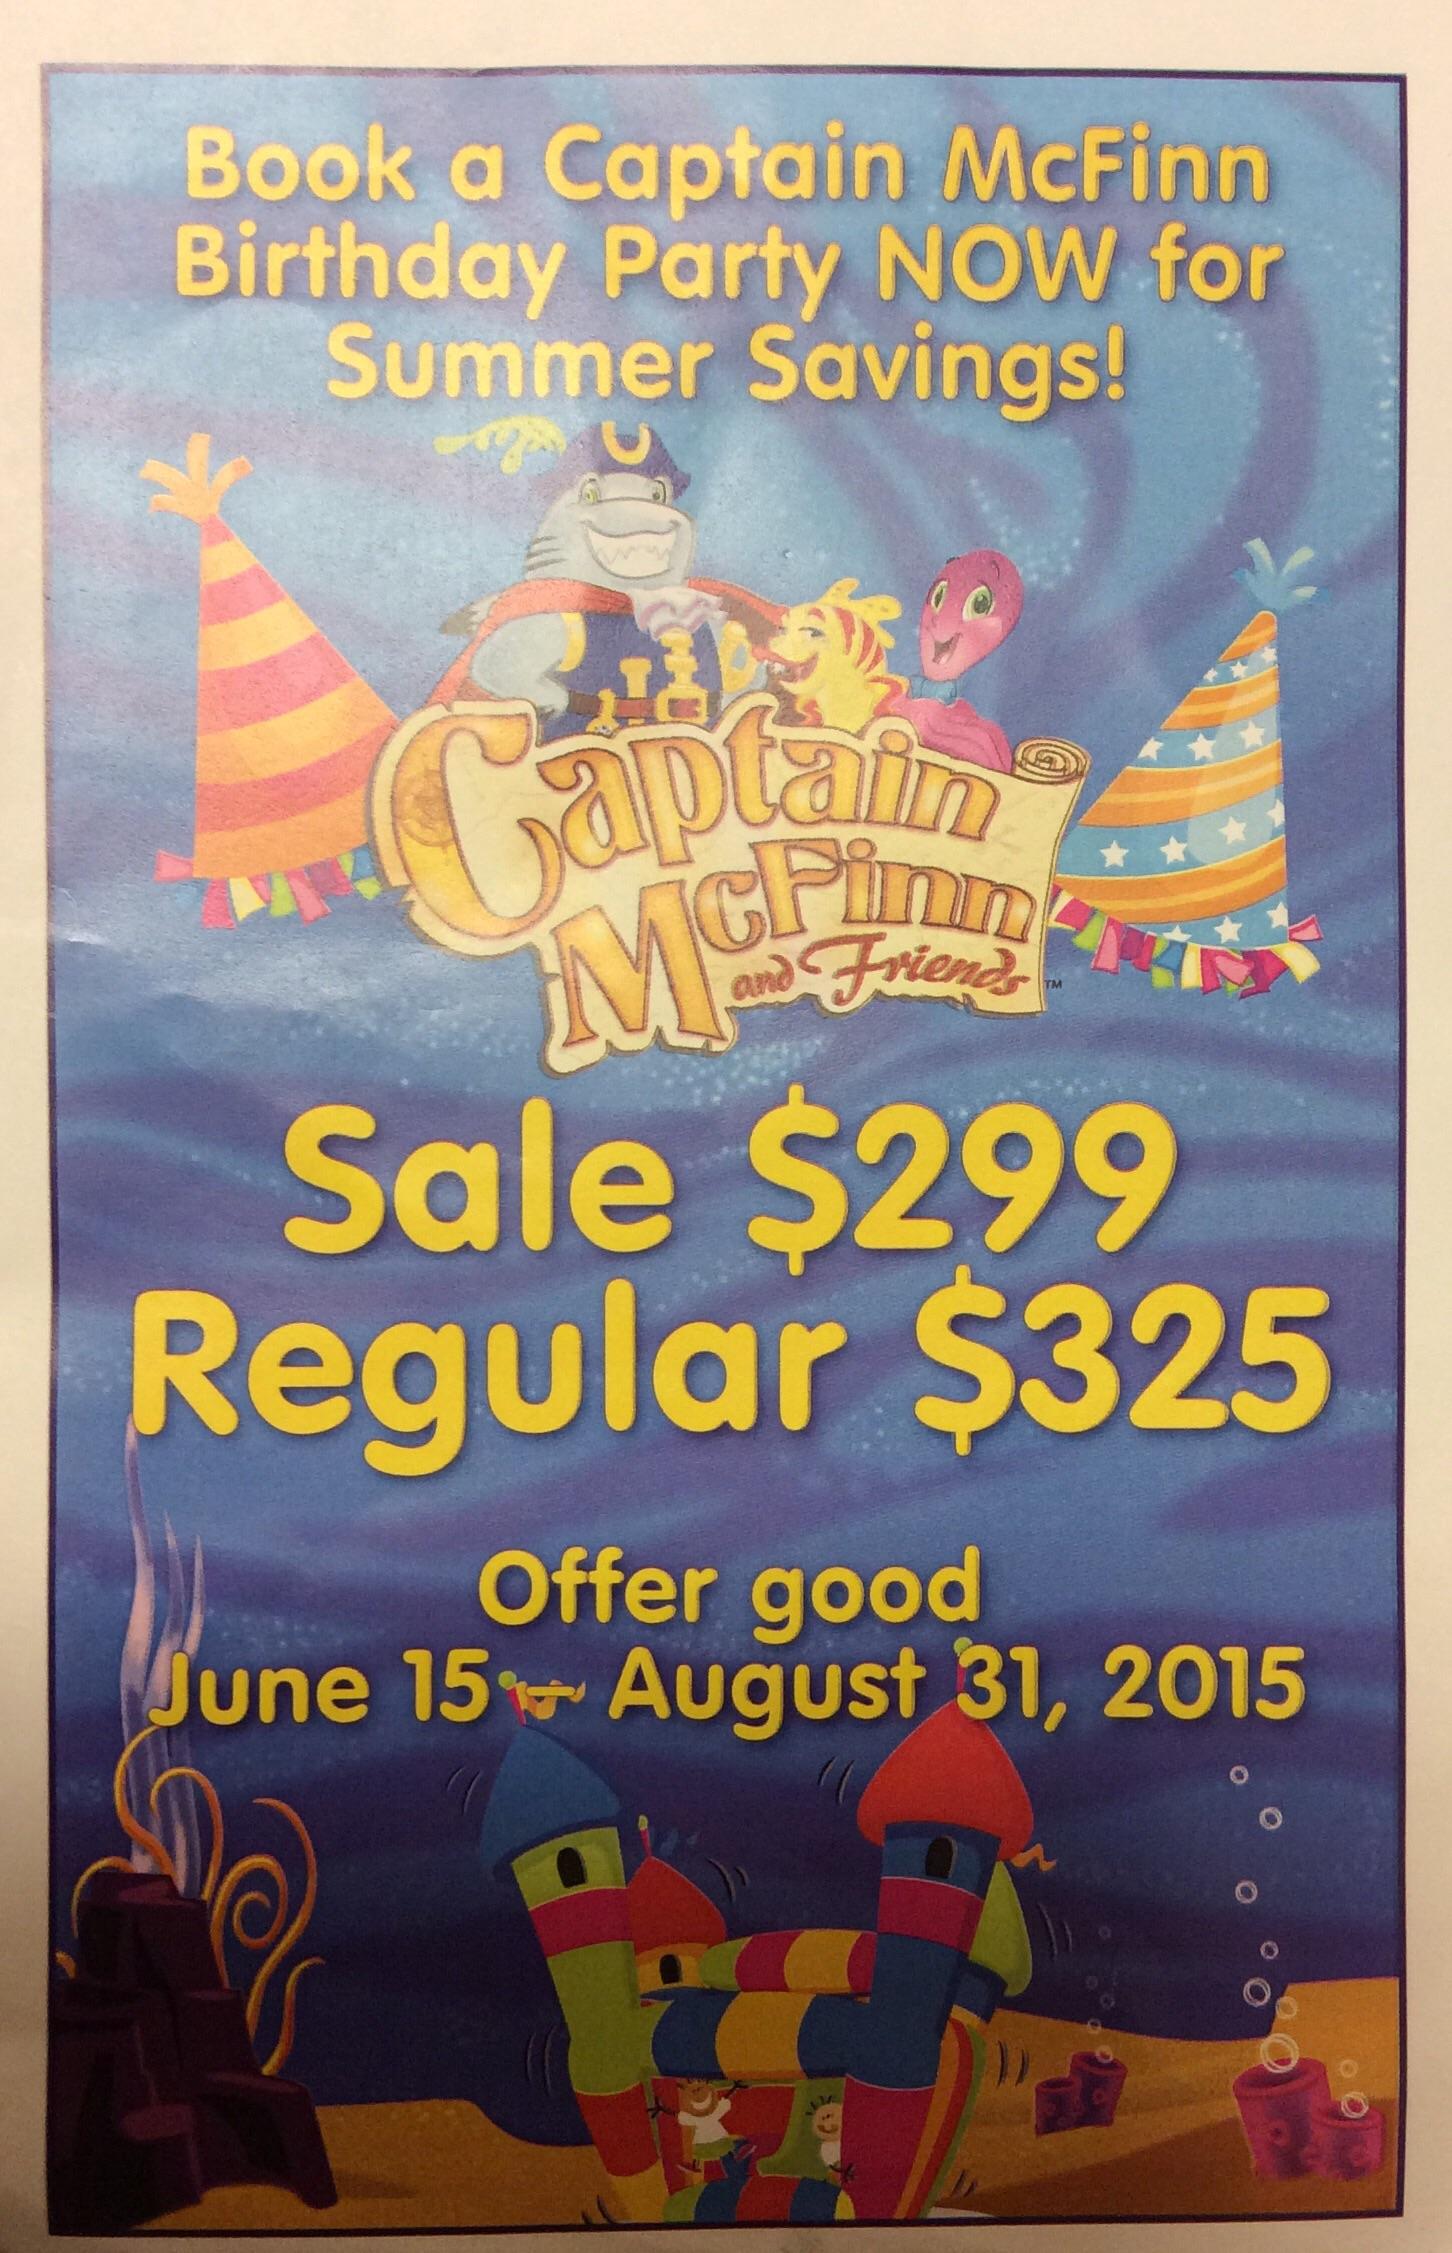 Captain McFinn Birthday Party Summer Savings at Captain McFinn Gift Shop